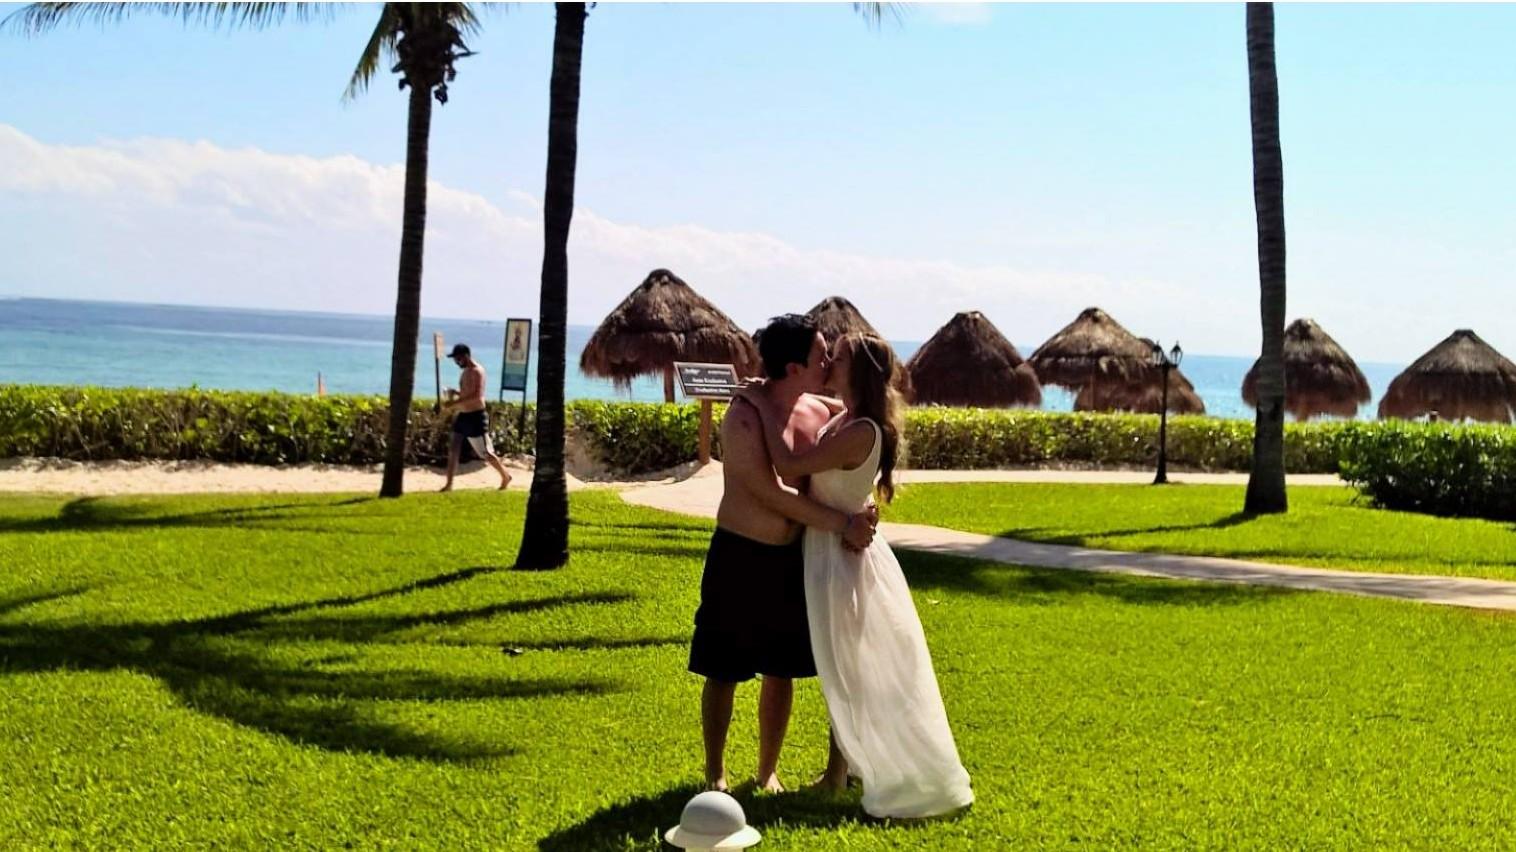 Image 3 of Soraya and Juan